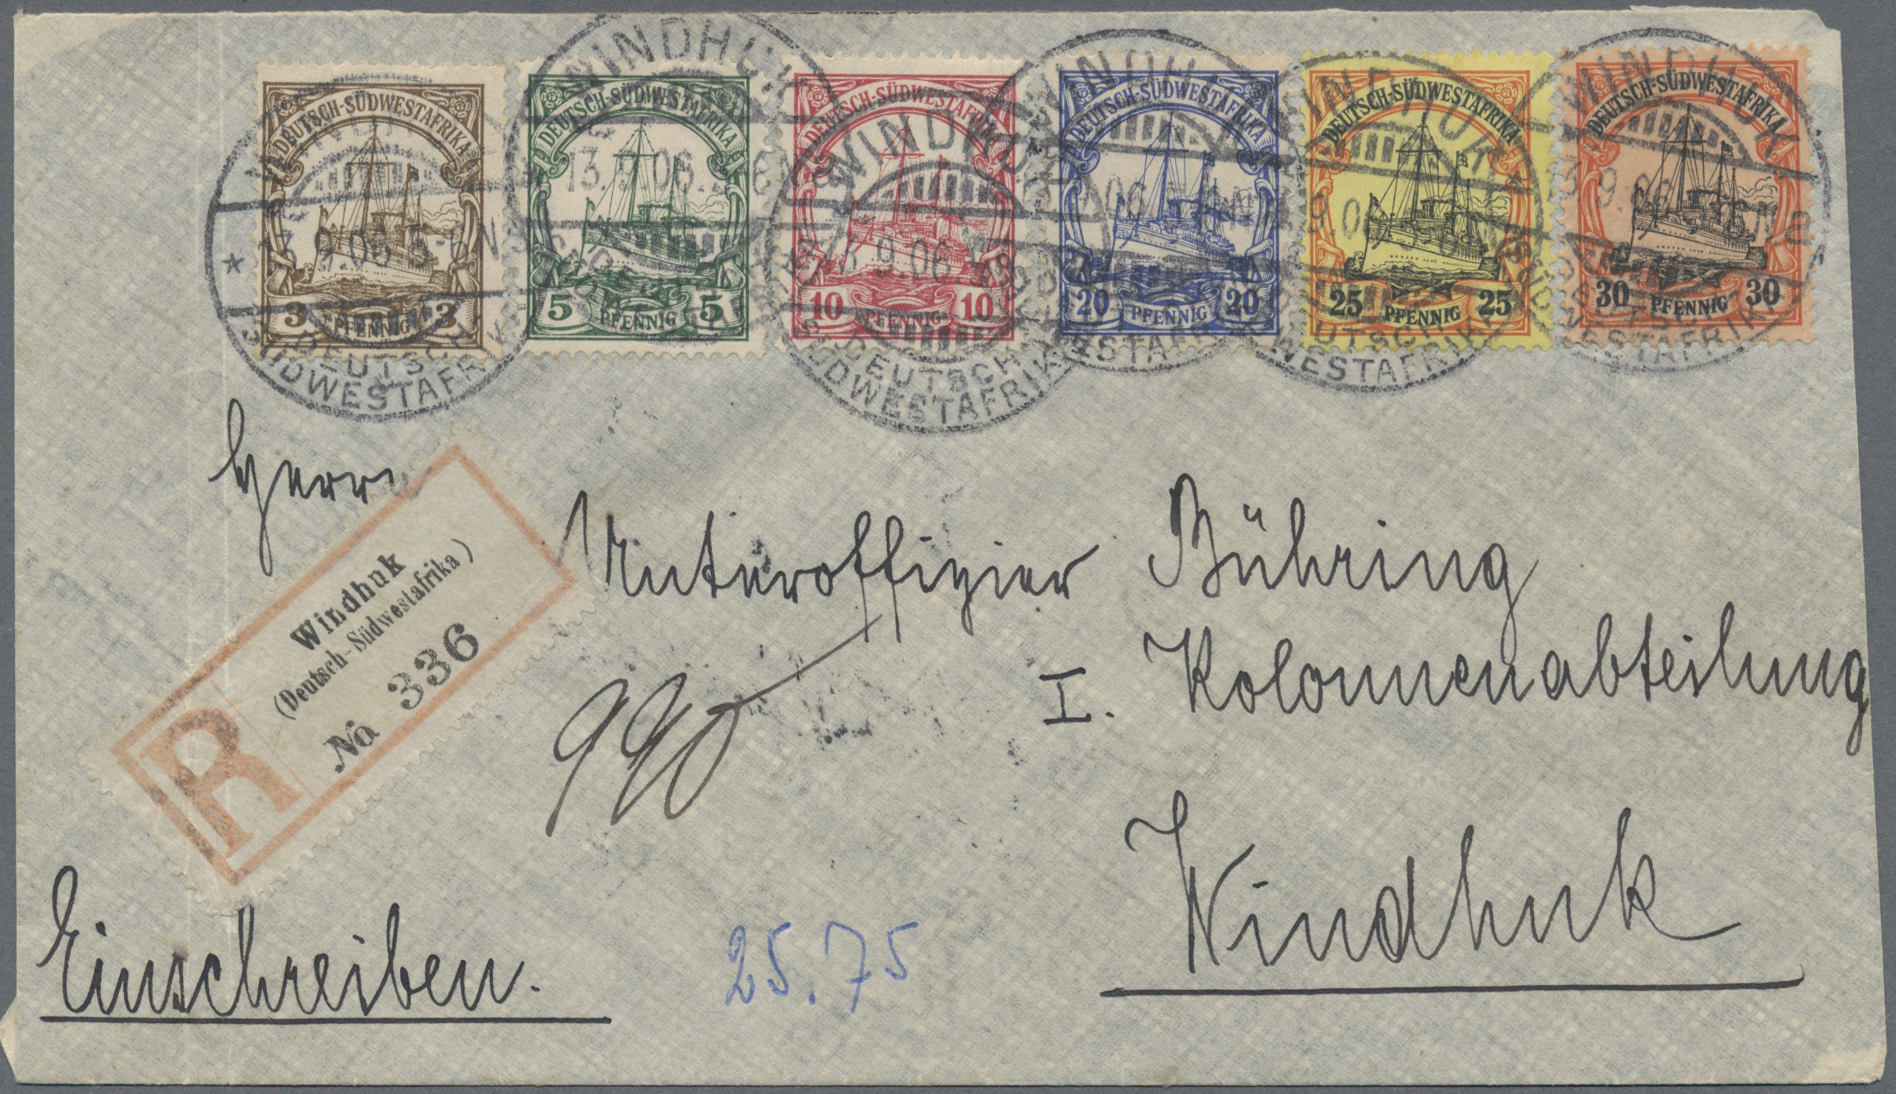 Lot 37199 - Deutsche Auslandspostämter + Kolonien  -  Auktionshaus Christoph Gärtner GmbH & Co. KG Collections Germany,  Collections Supplement, Surprise boxes #39 Day 7